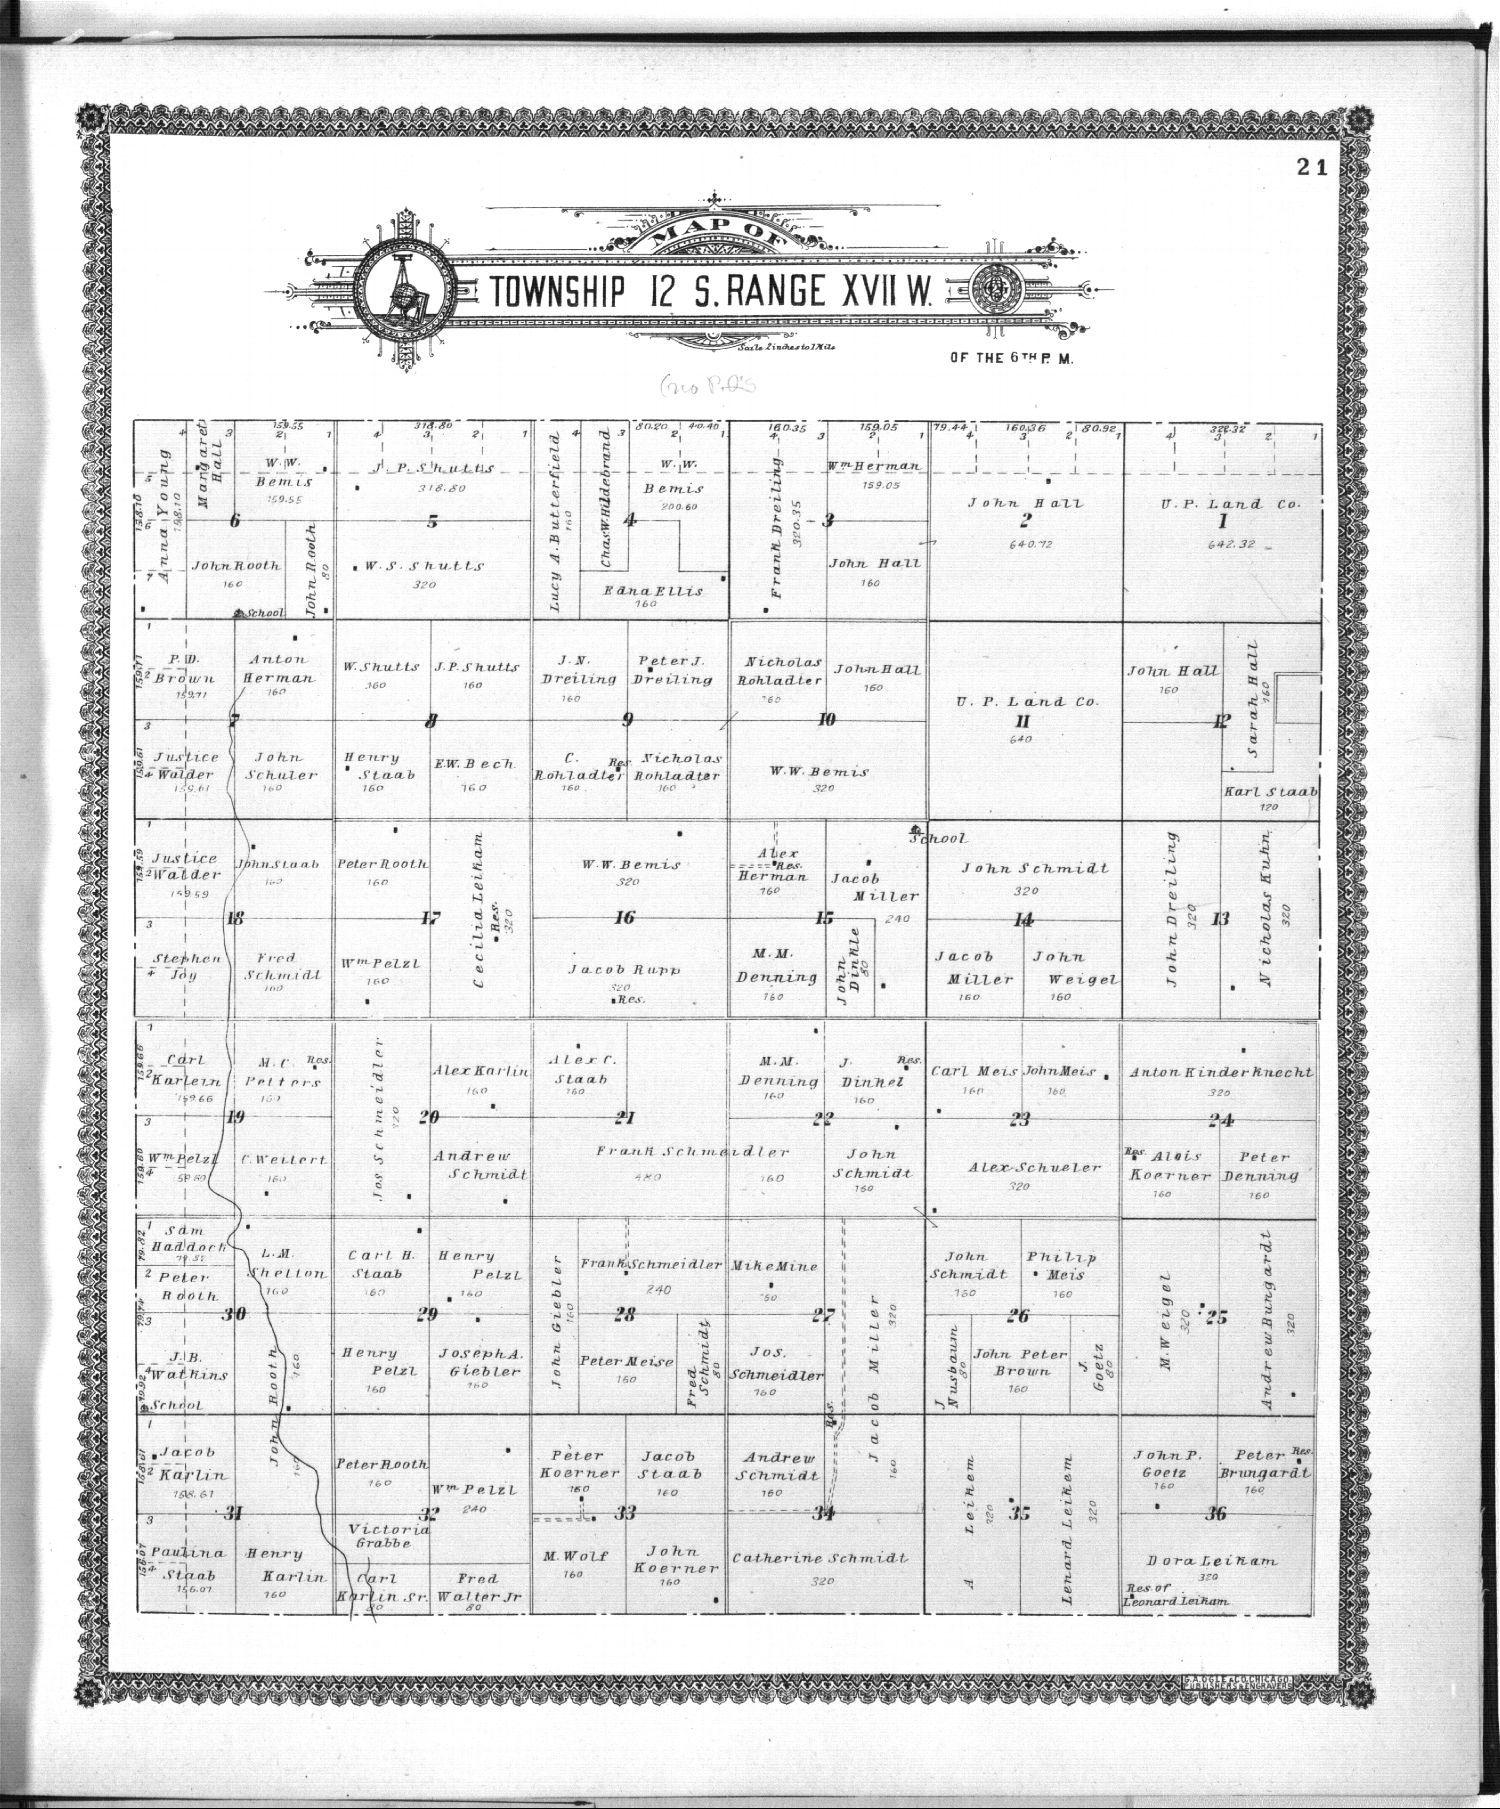 Standard atlas of Ellis County, Kansas - 21